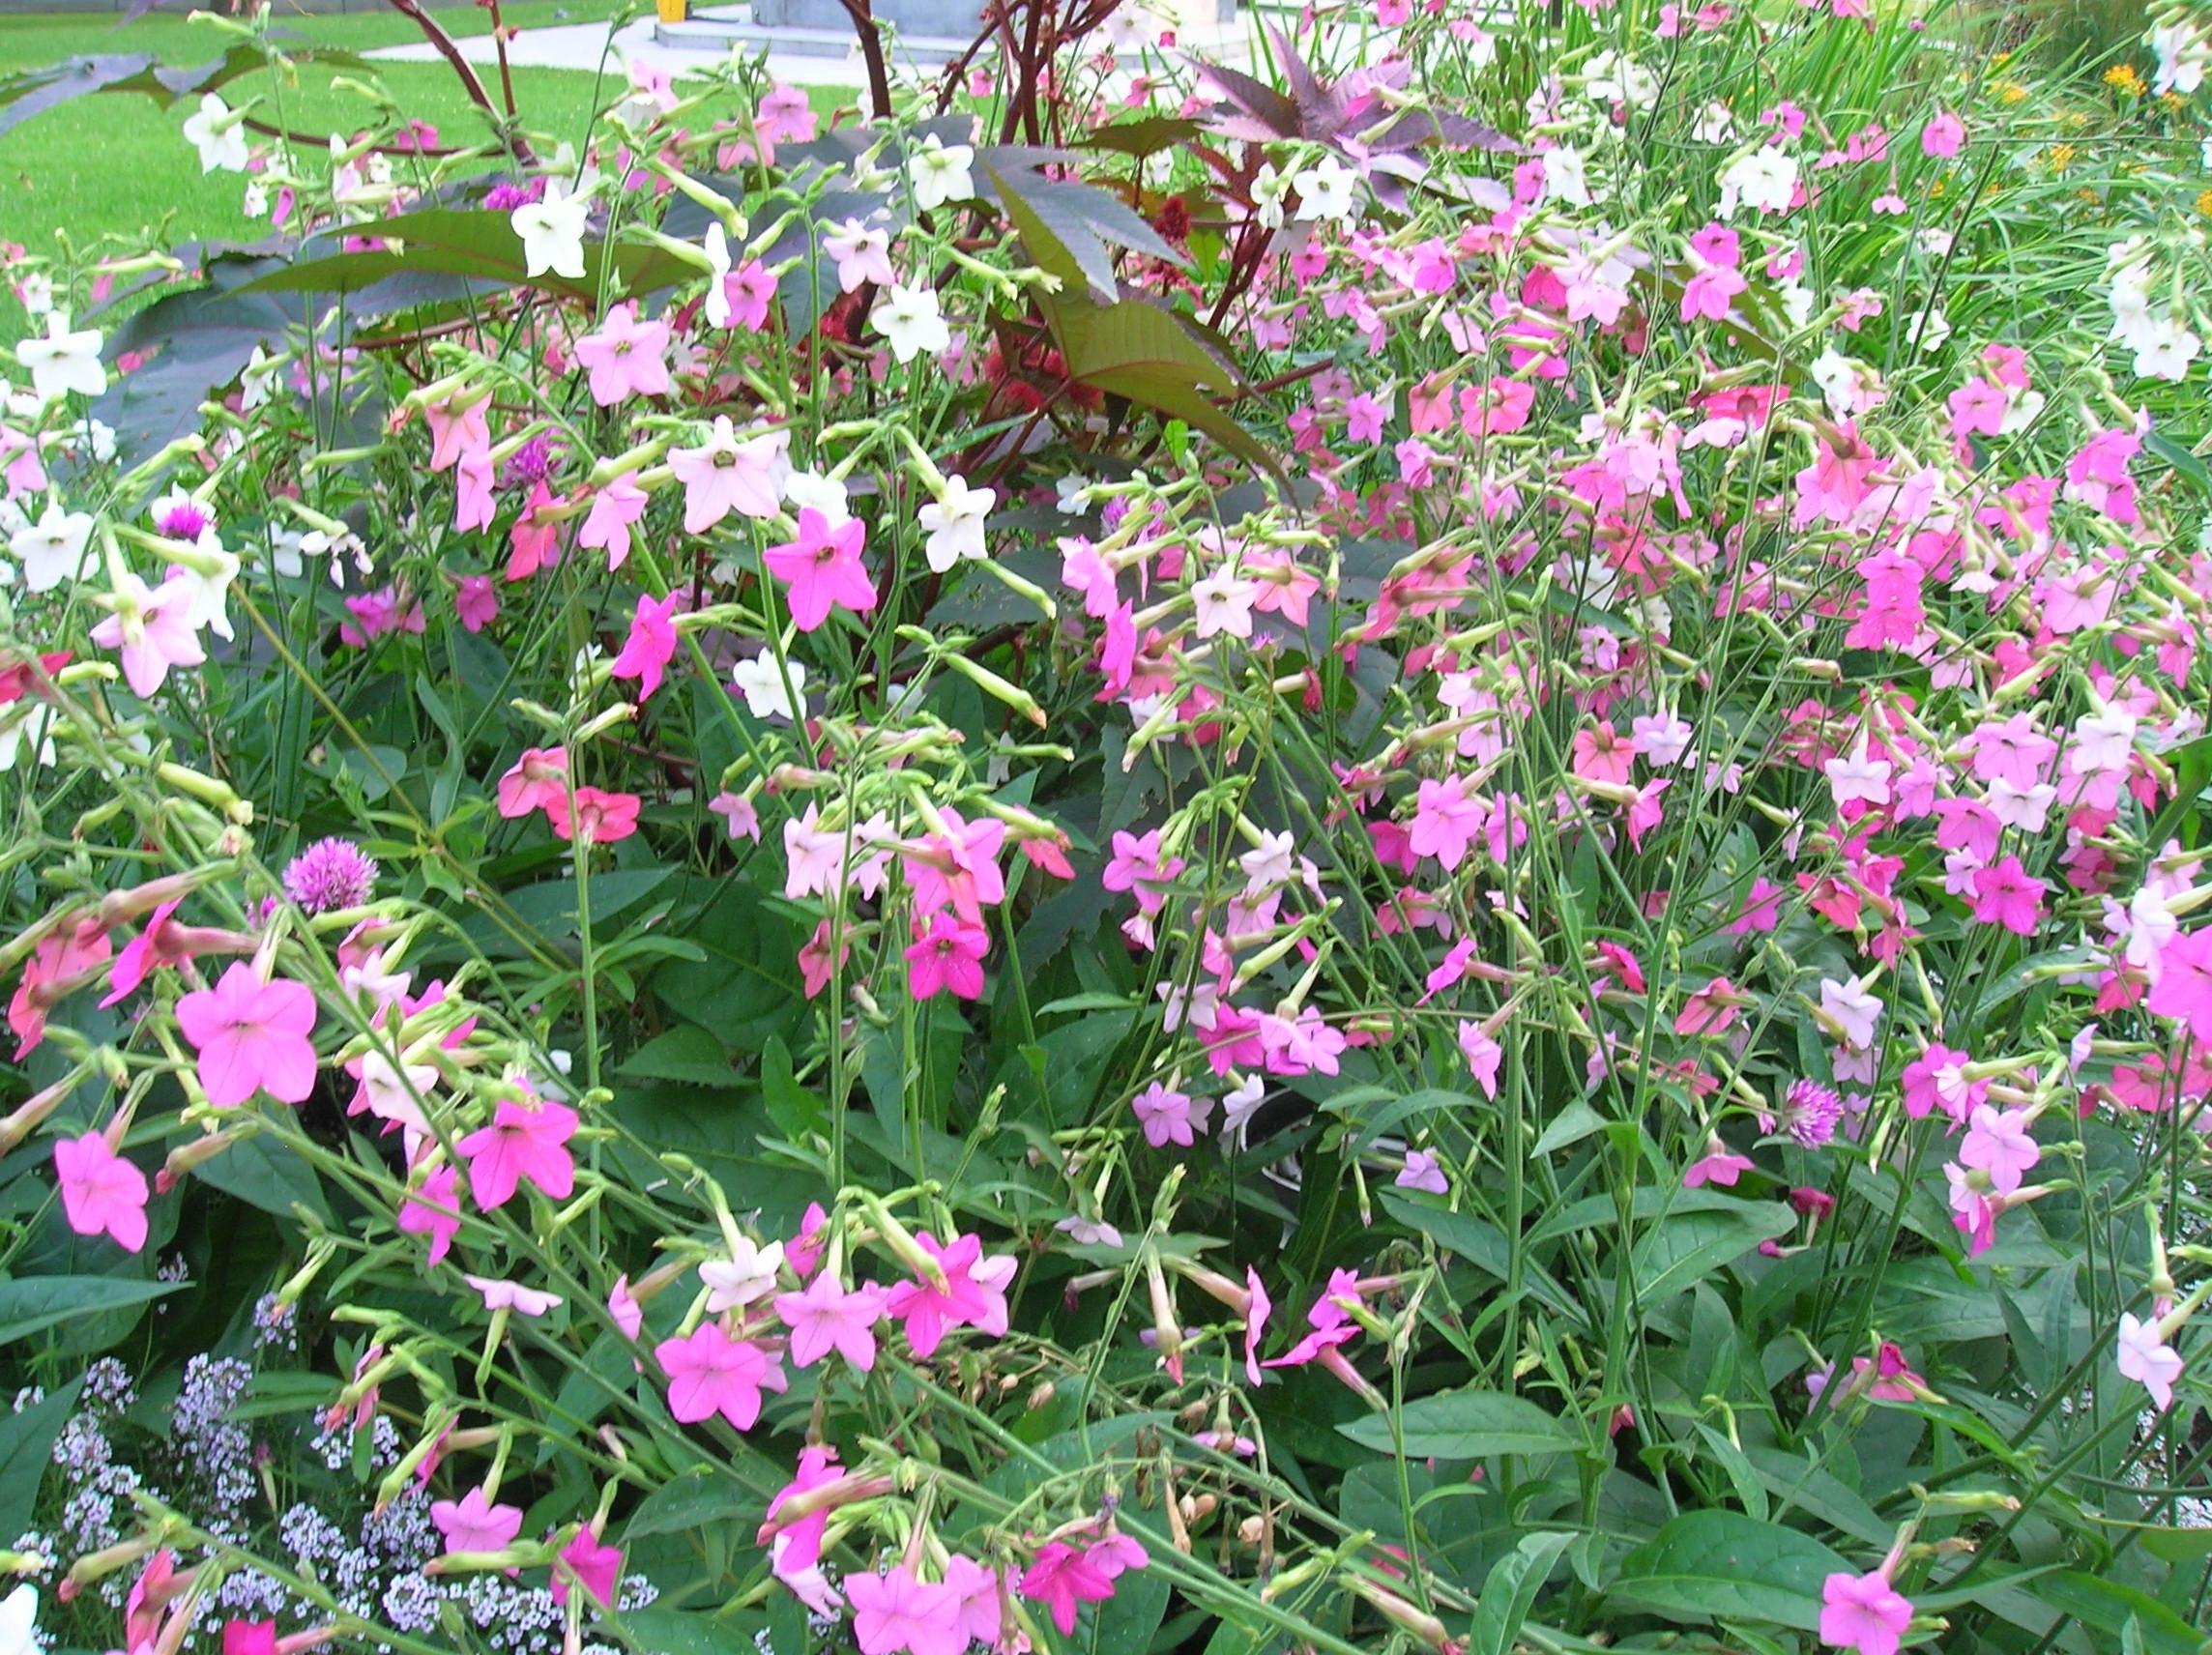 How To Grow Nicotiana Gardening Nicotiana Growing Nicotiana